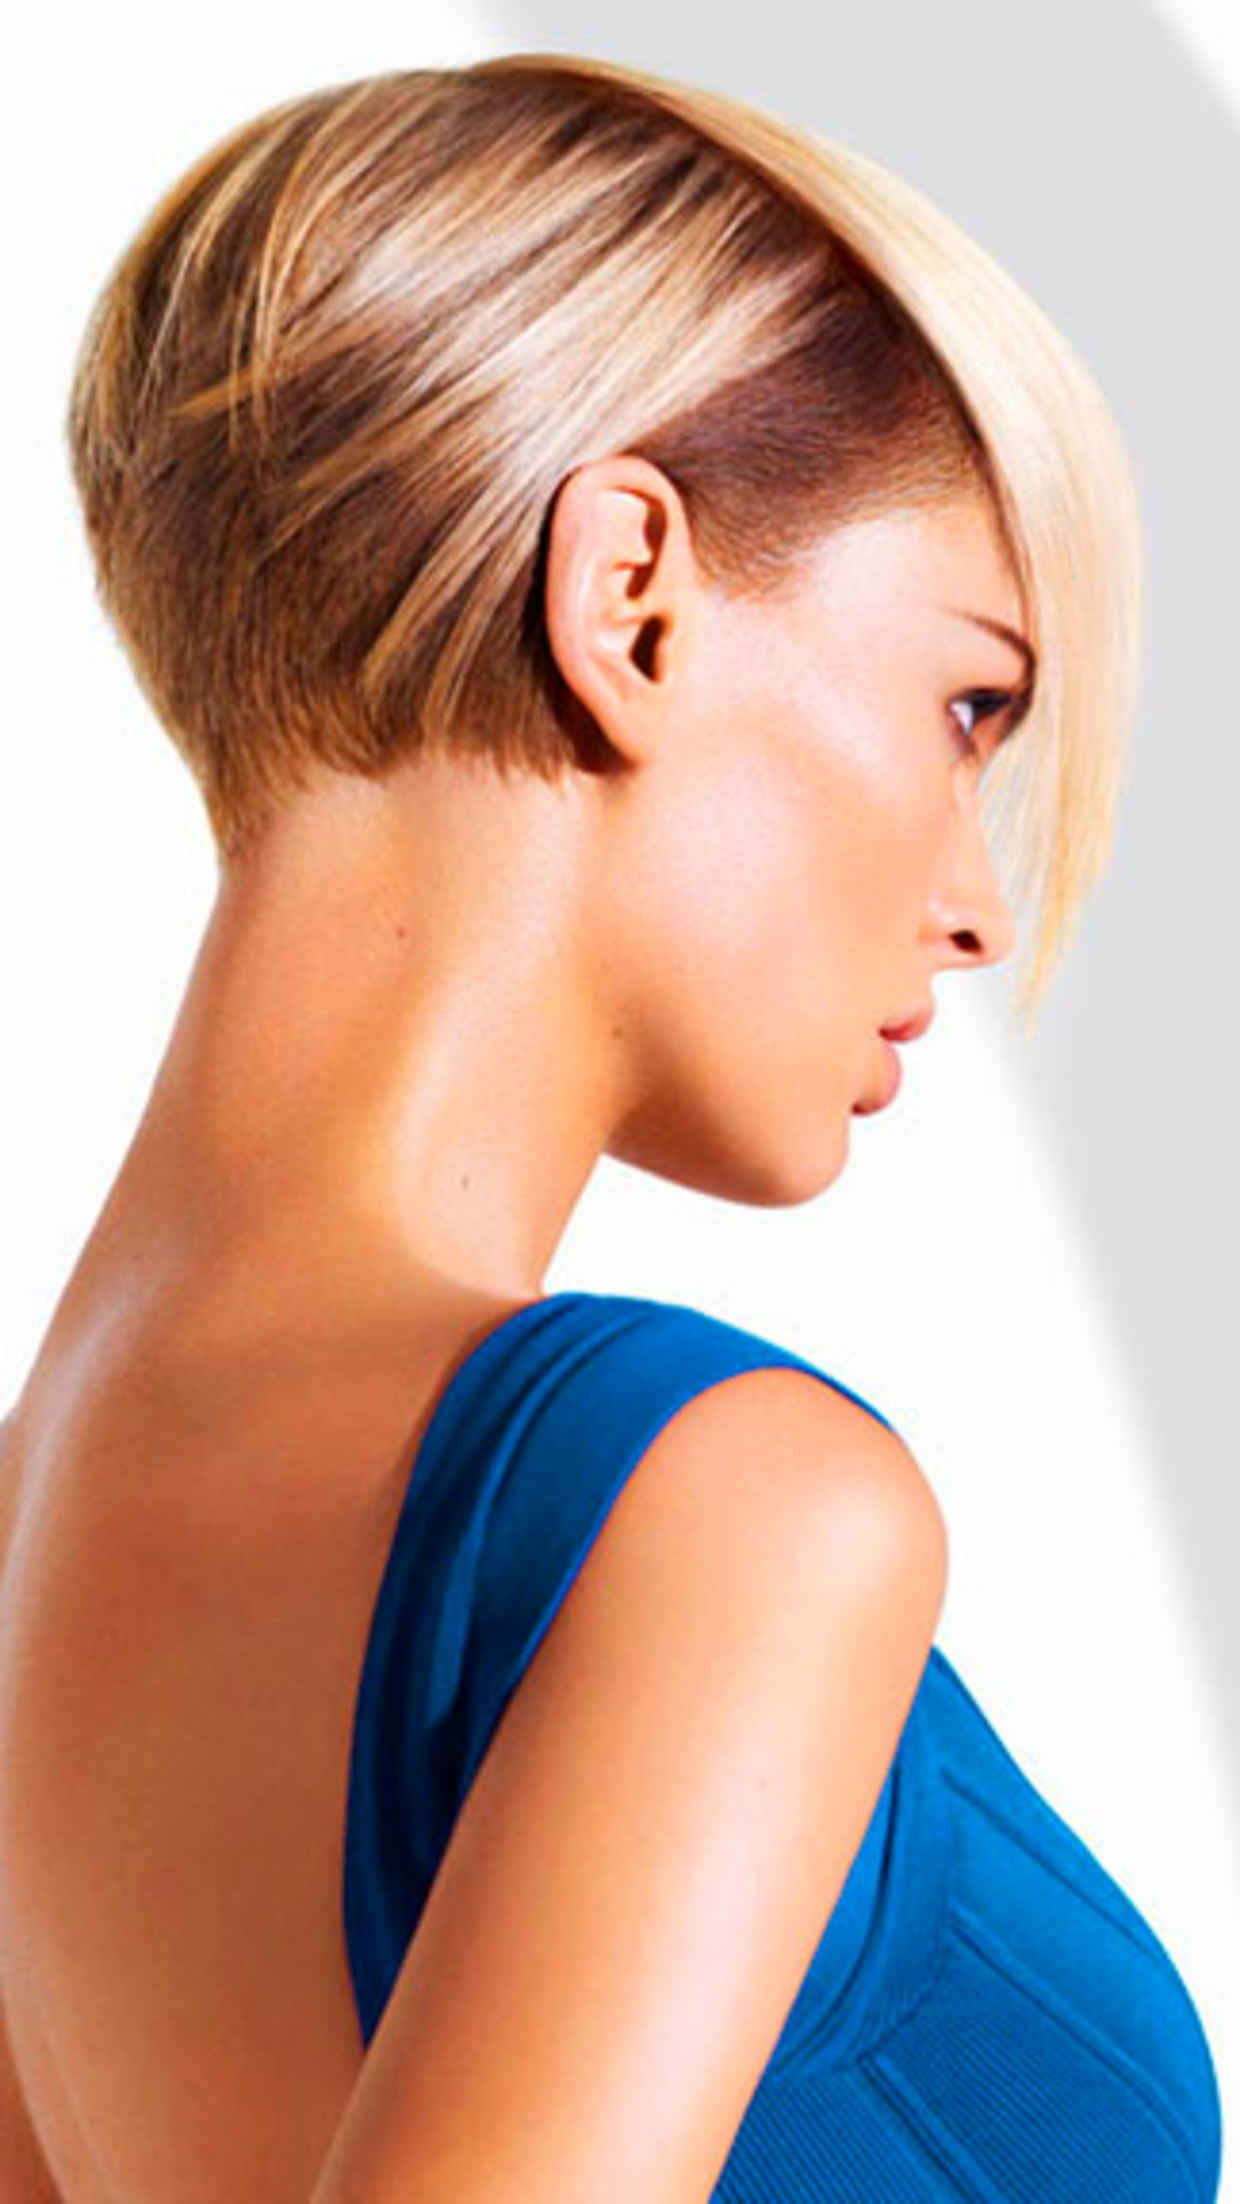 Hair Therapy Late Summer TLC at Vidal Sassoon Beautygeeks